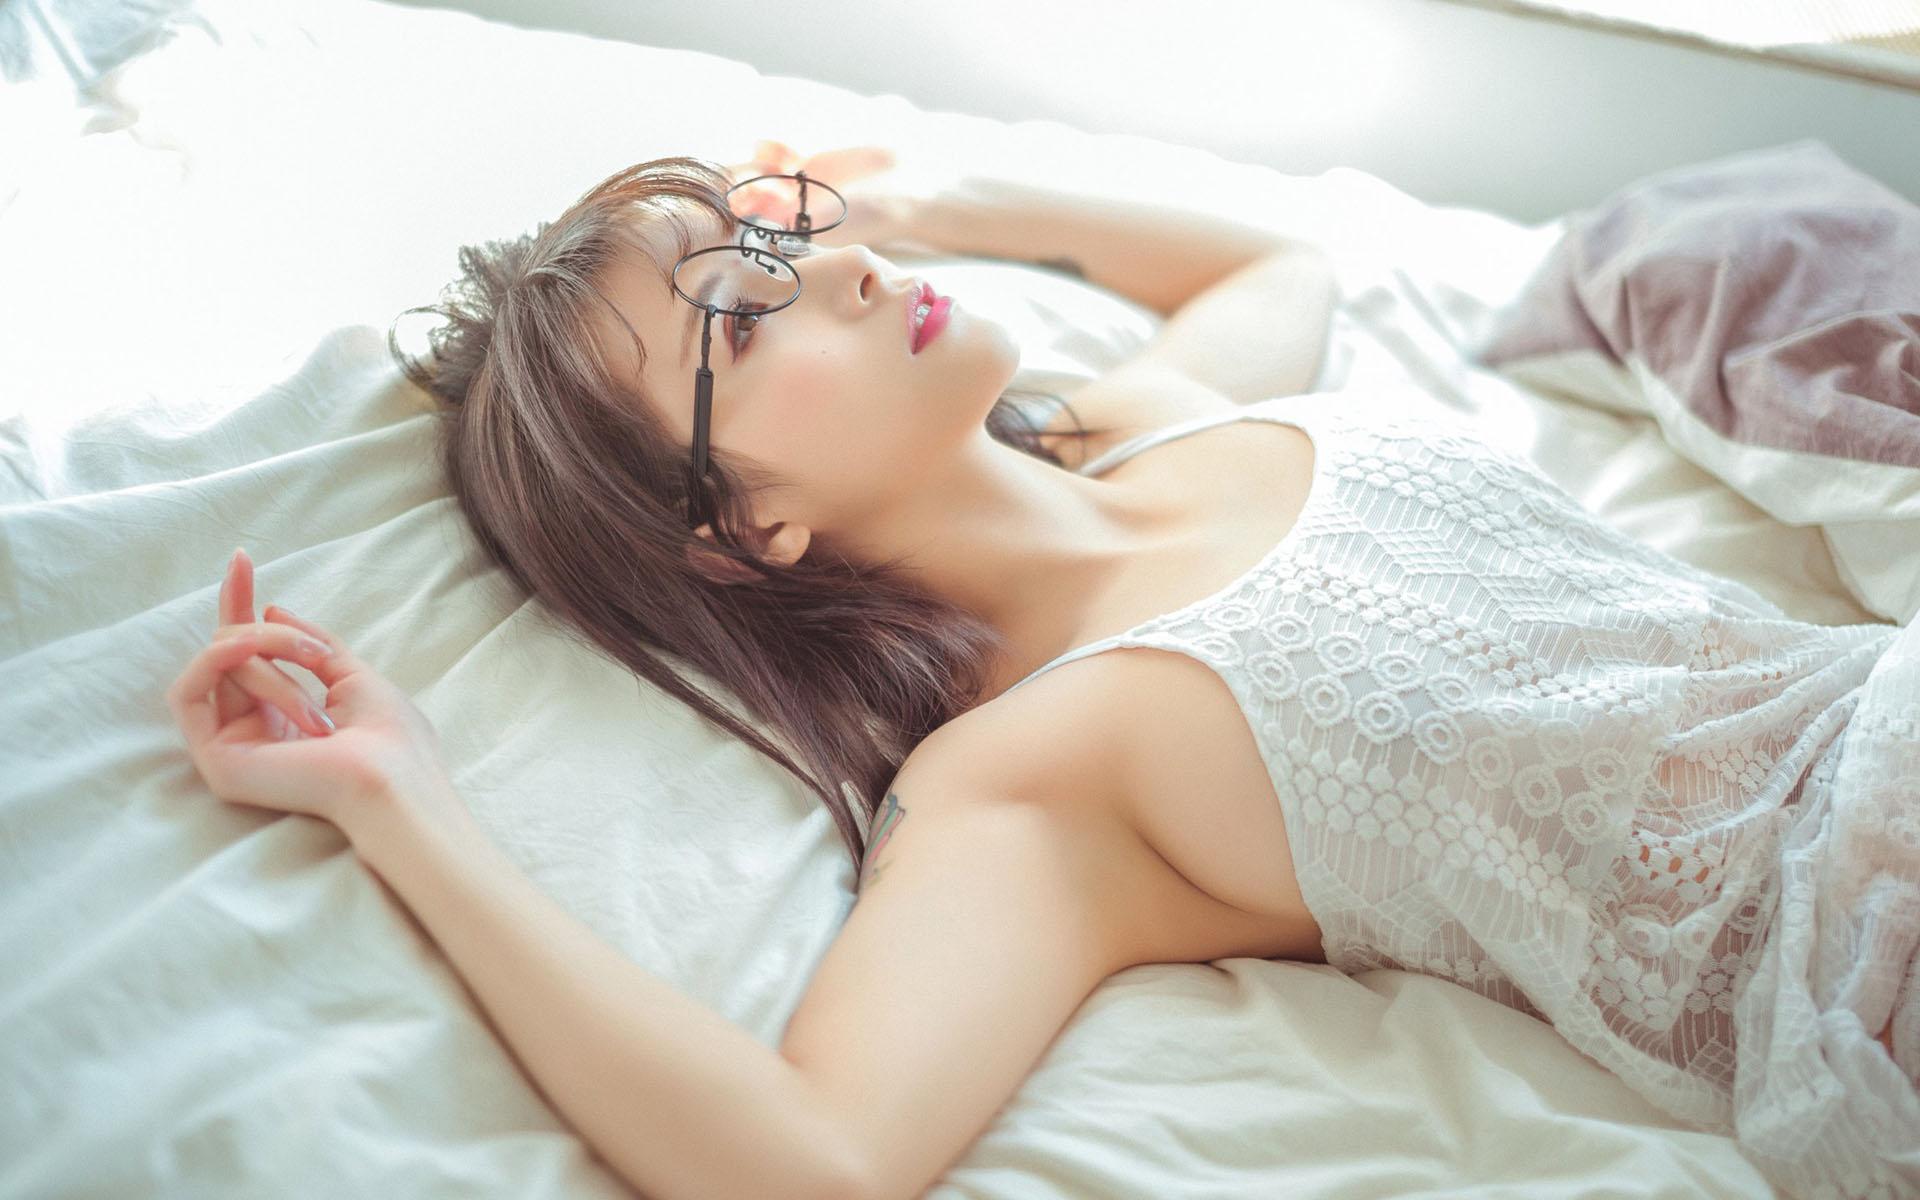 Проститутки азиатки на кровати